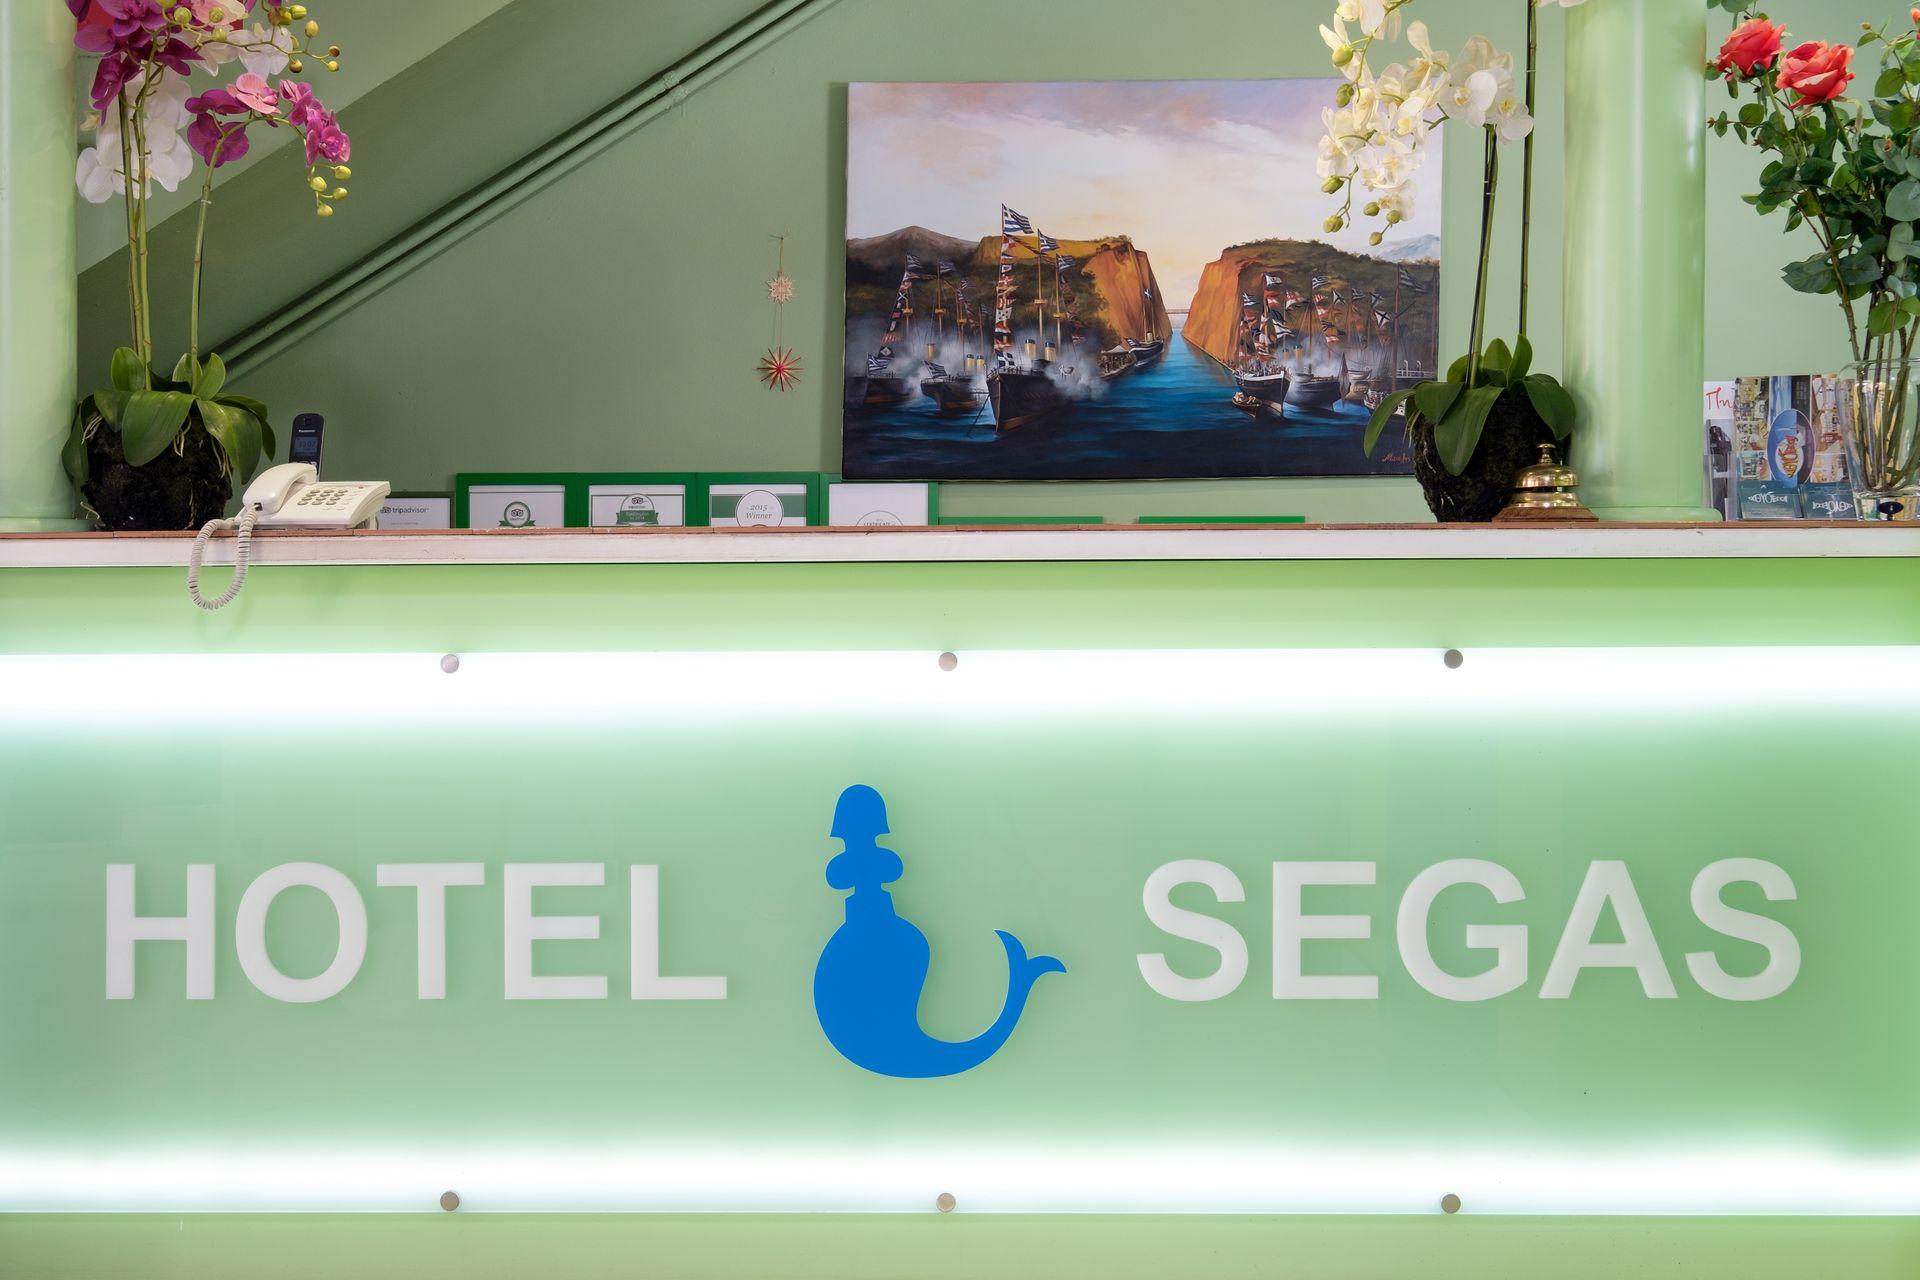 _lobby 0661_2020_06_hotel segas-edit_resized